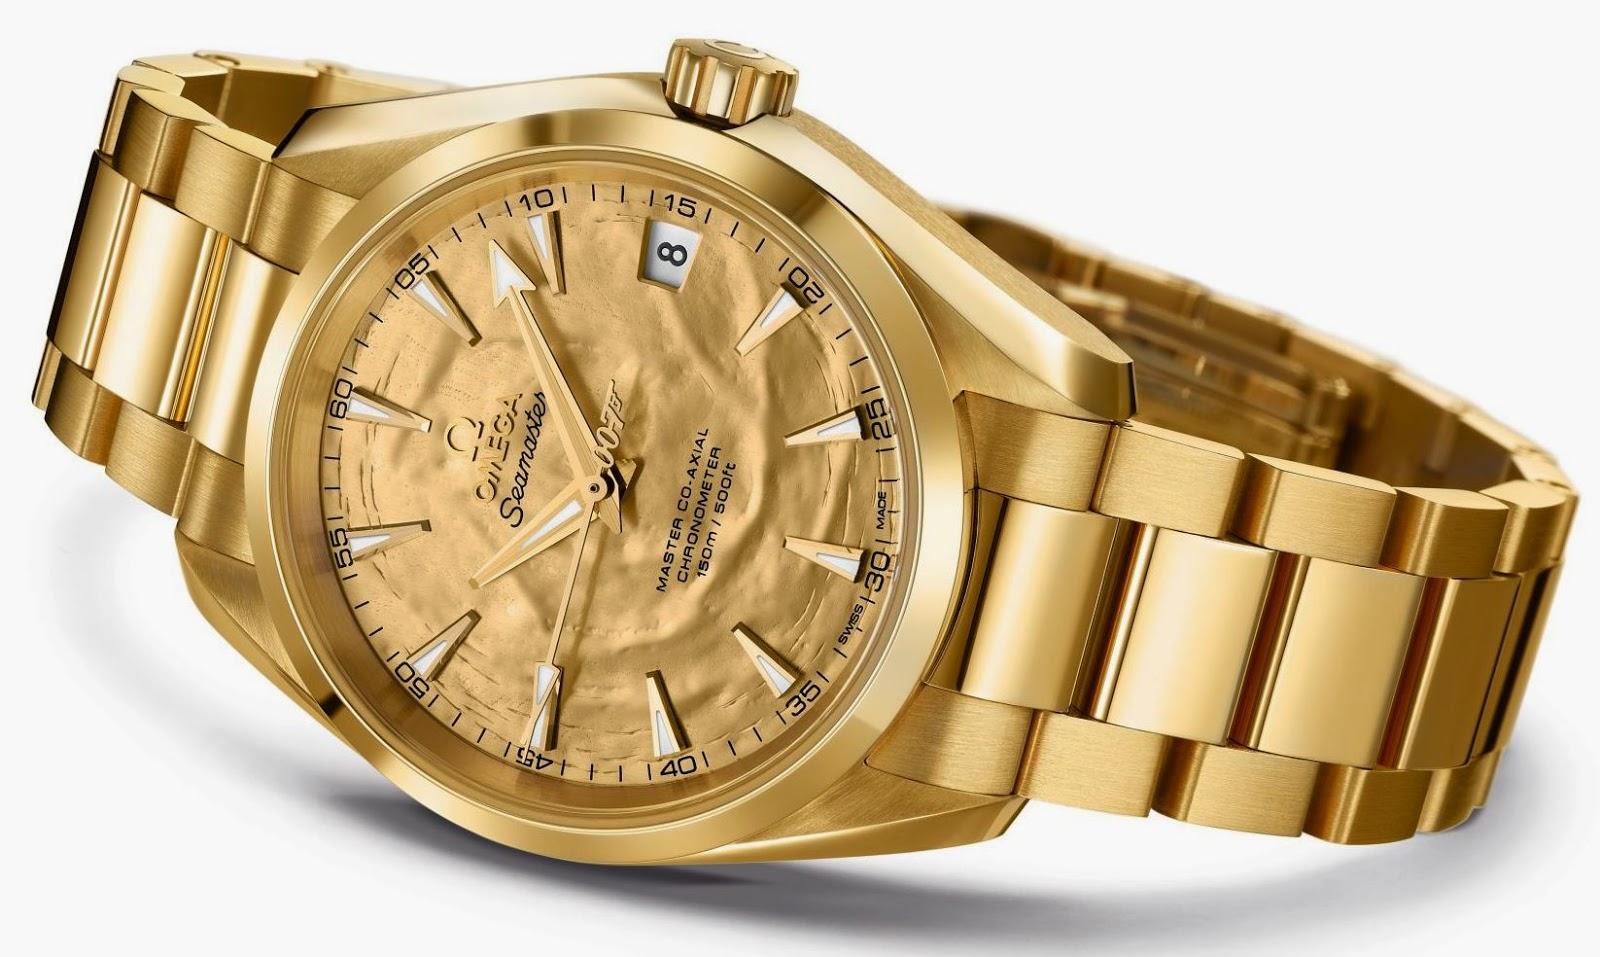 OMEGA Seamaster Aqua Terra Goldfinger replica watch